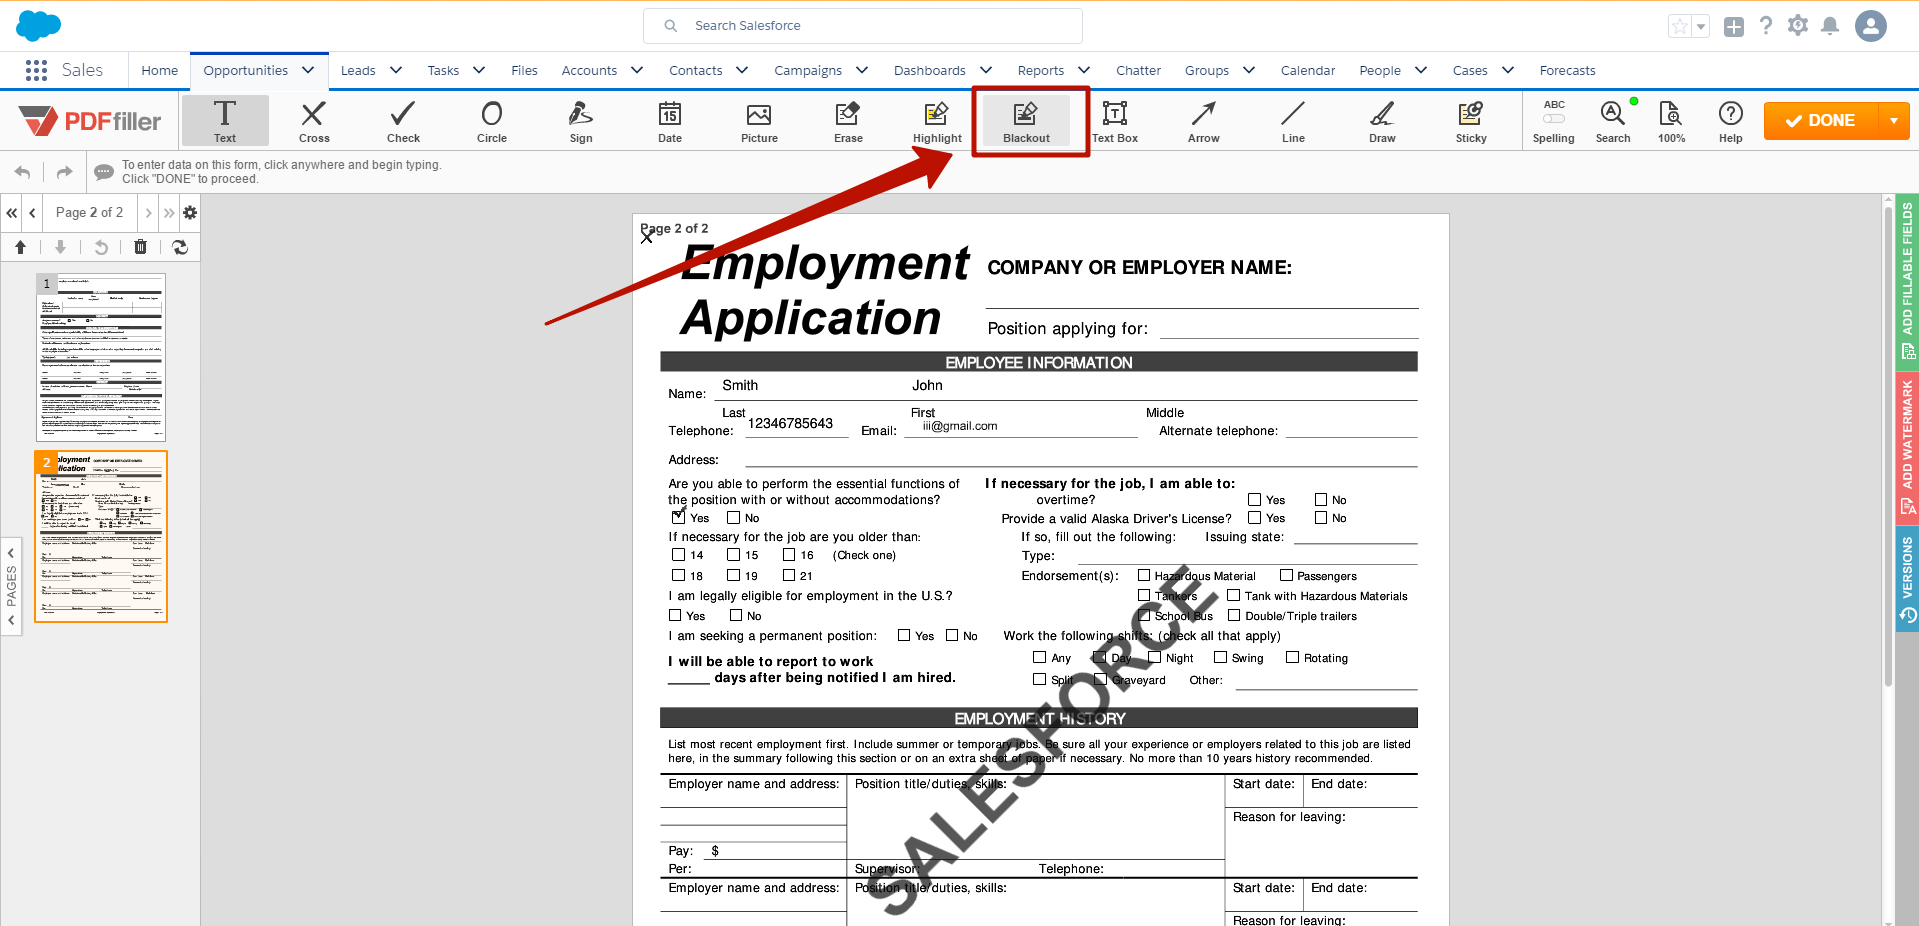 DaDaDocs integration with Salesforce account